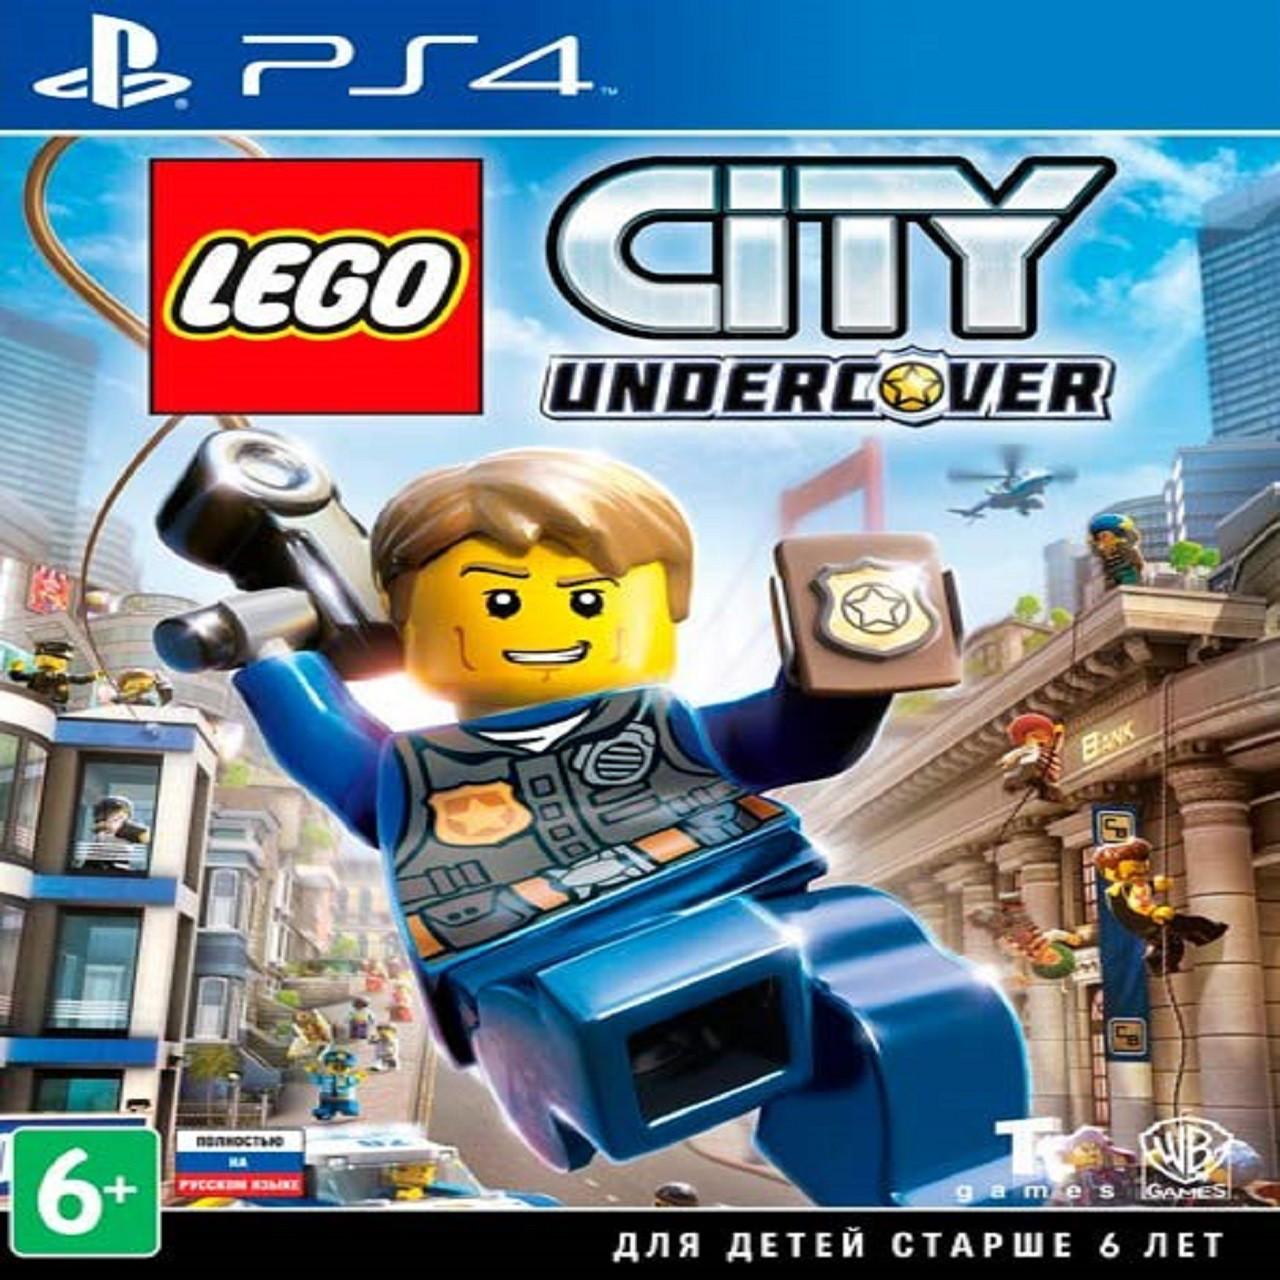 LEGO City Undercover (російська версія) PS4